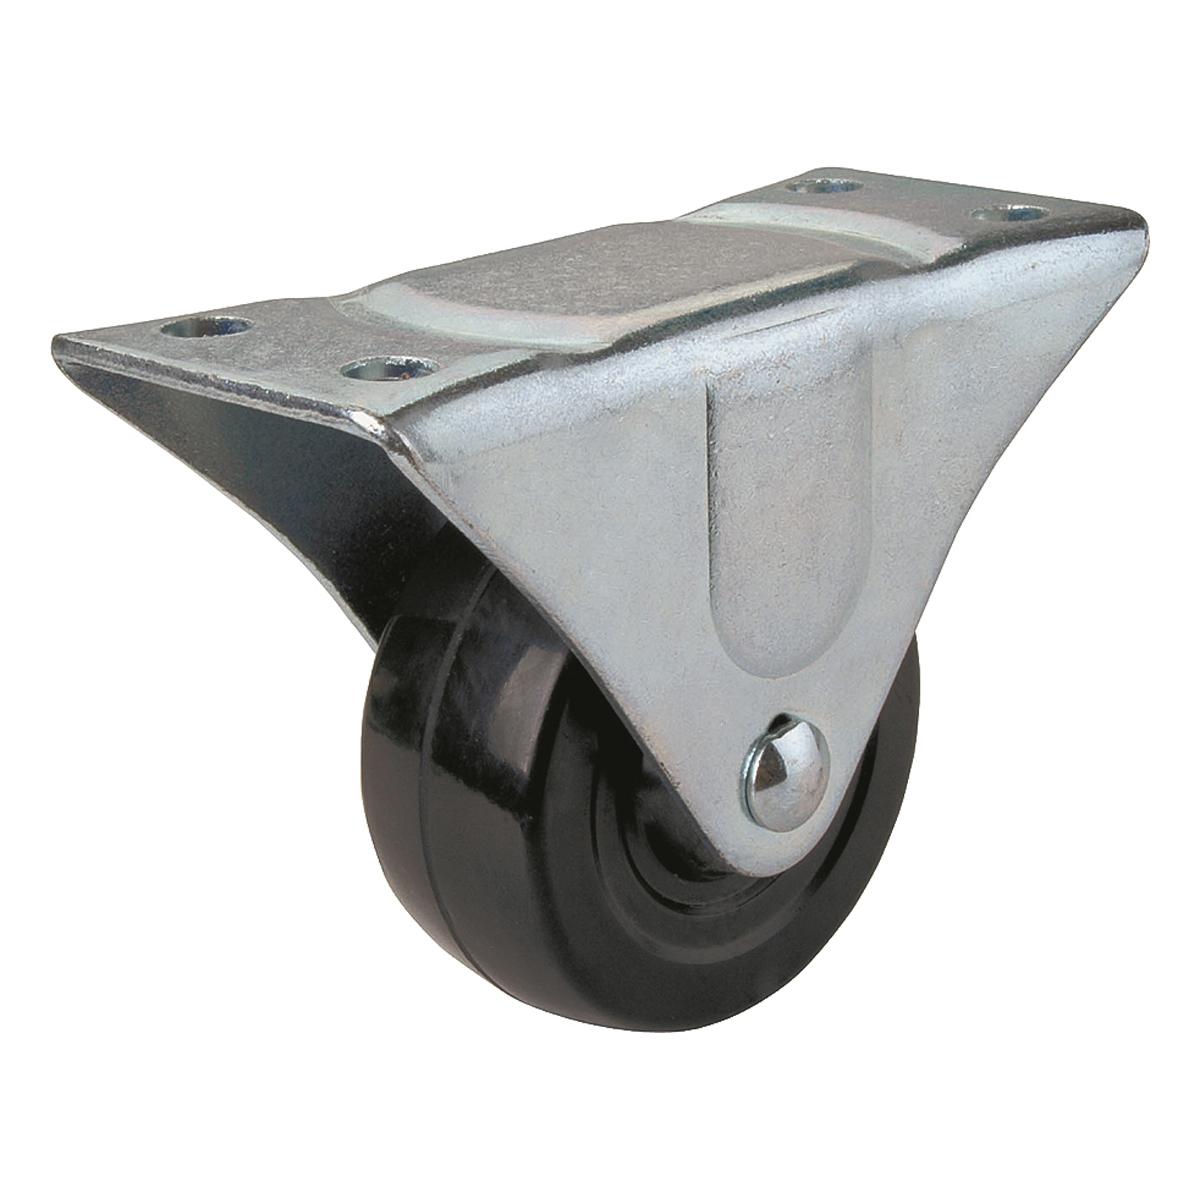 Picture of ProSource JC-H03 Rigid Caster, 3 in Dia Wheel, 1-1/4 in W Wheel, Rubber Wheel, Black, 210 lb